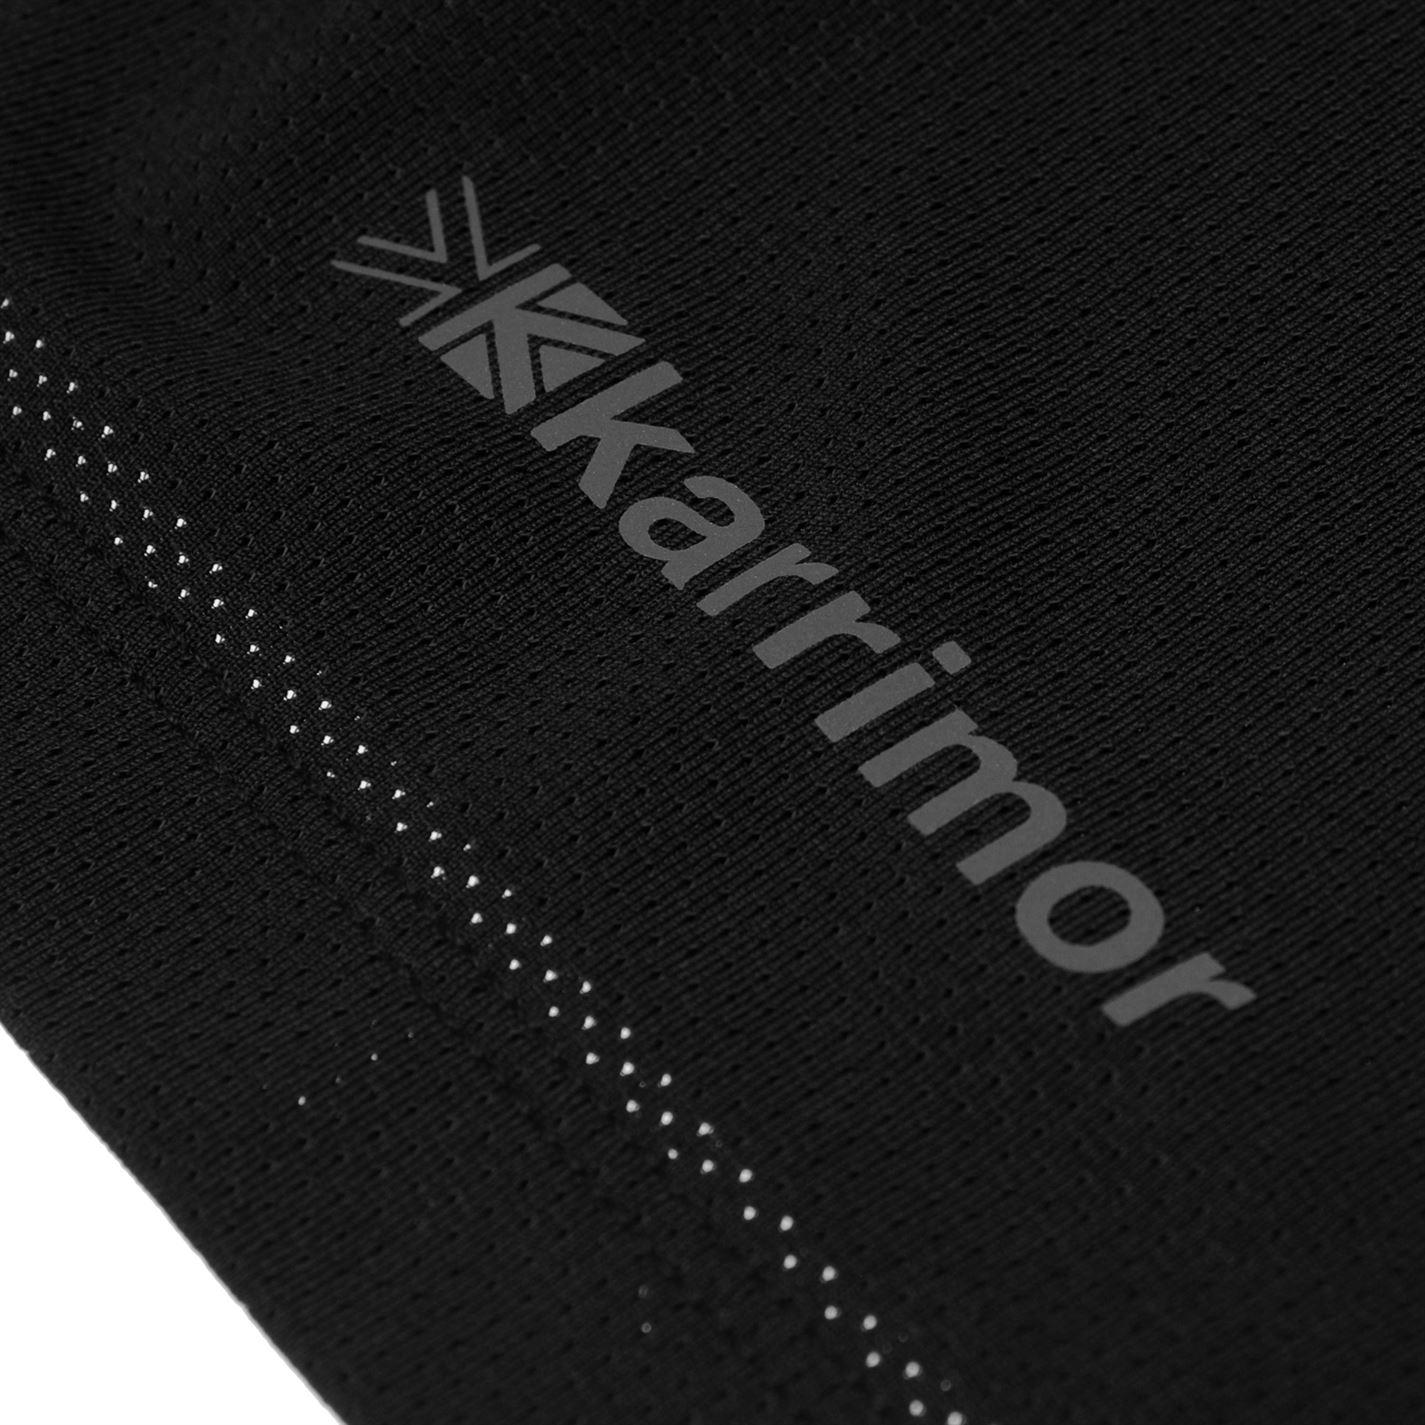 Karrimor-Hombres-X-Lite-Camiseta-mangas-cortas-de-carrera-Rendimiento-Camiseta-Top-Cuello-Redondo miniatura 17